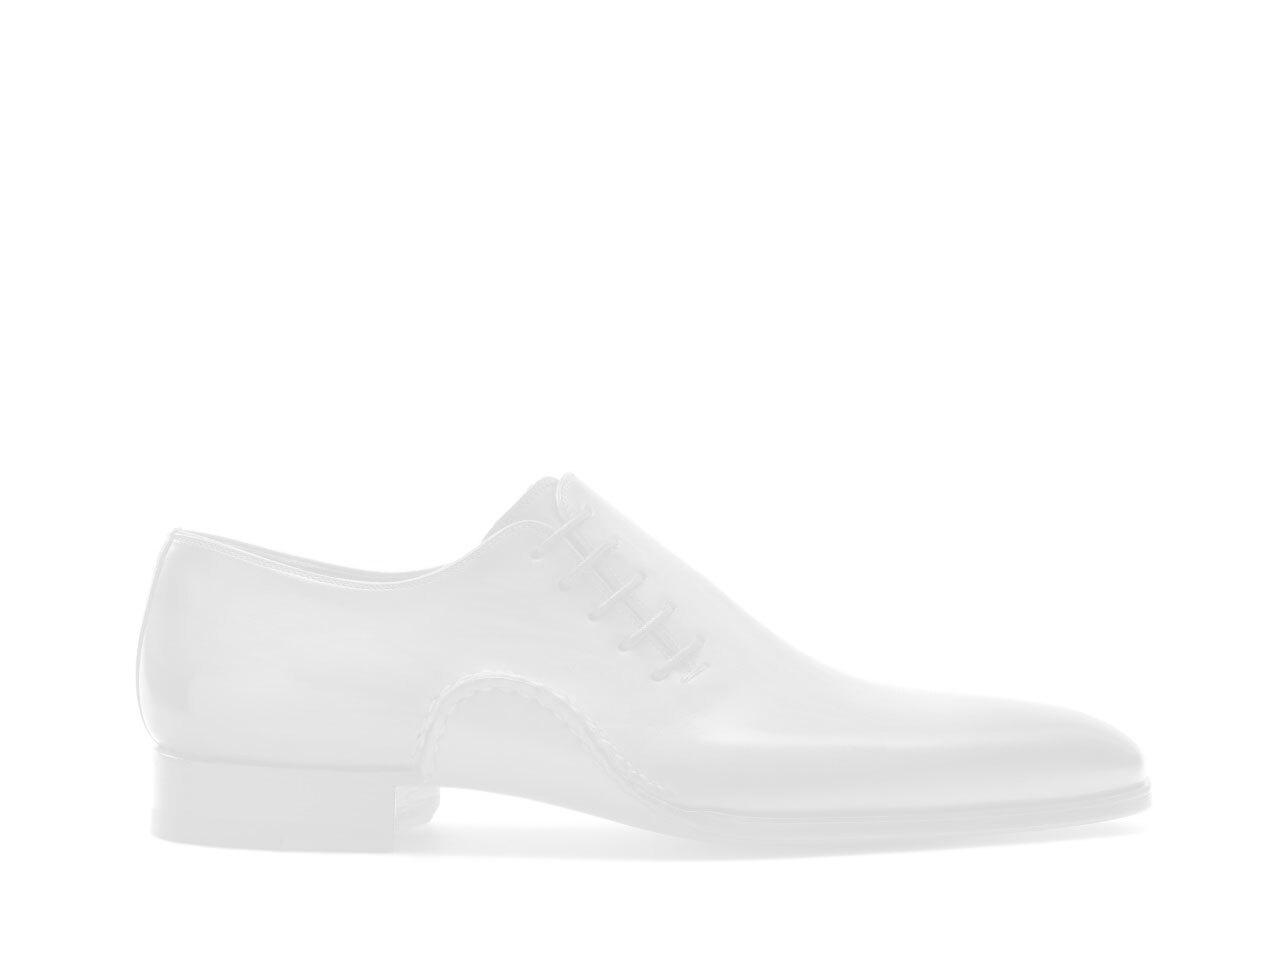 Sole of the Magnanni Saffron Wide Cuero Men's Oxford Shoes